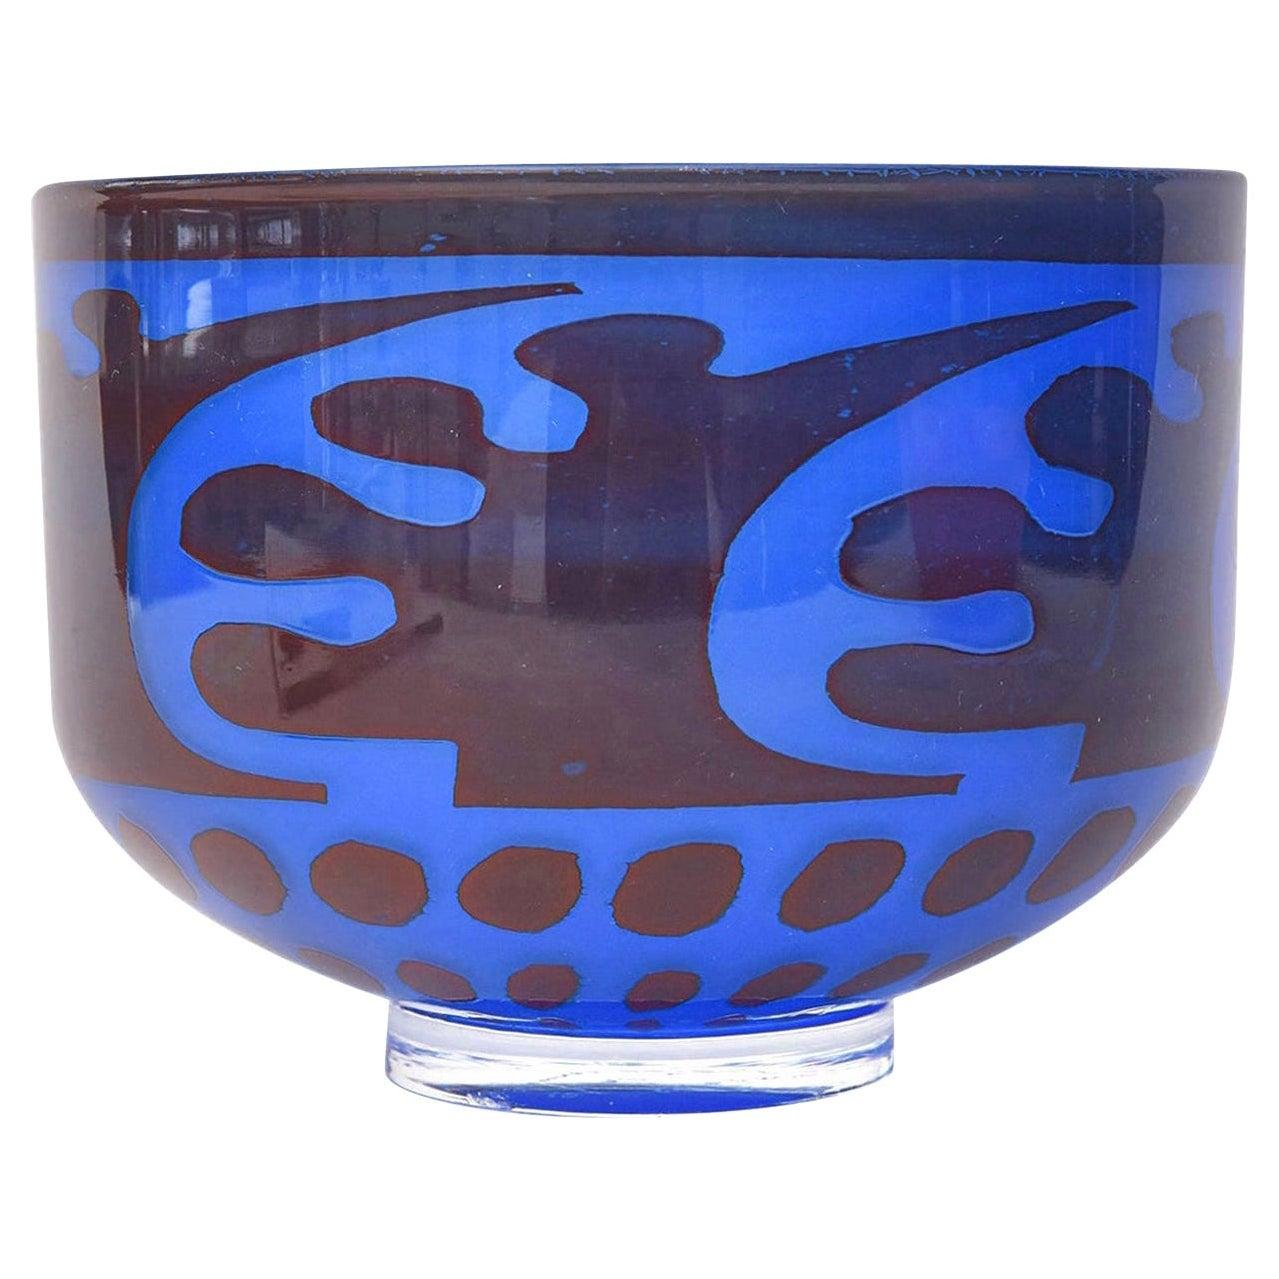 Orrefors Graal Glass Cobalt Blue Bowl by Gunnar Cyren Vintage